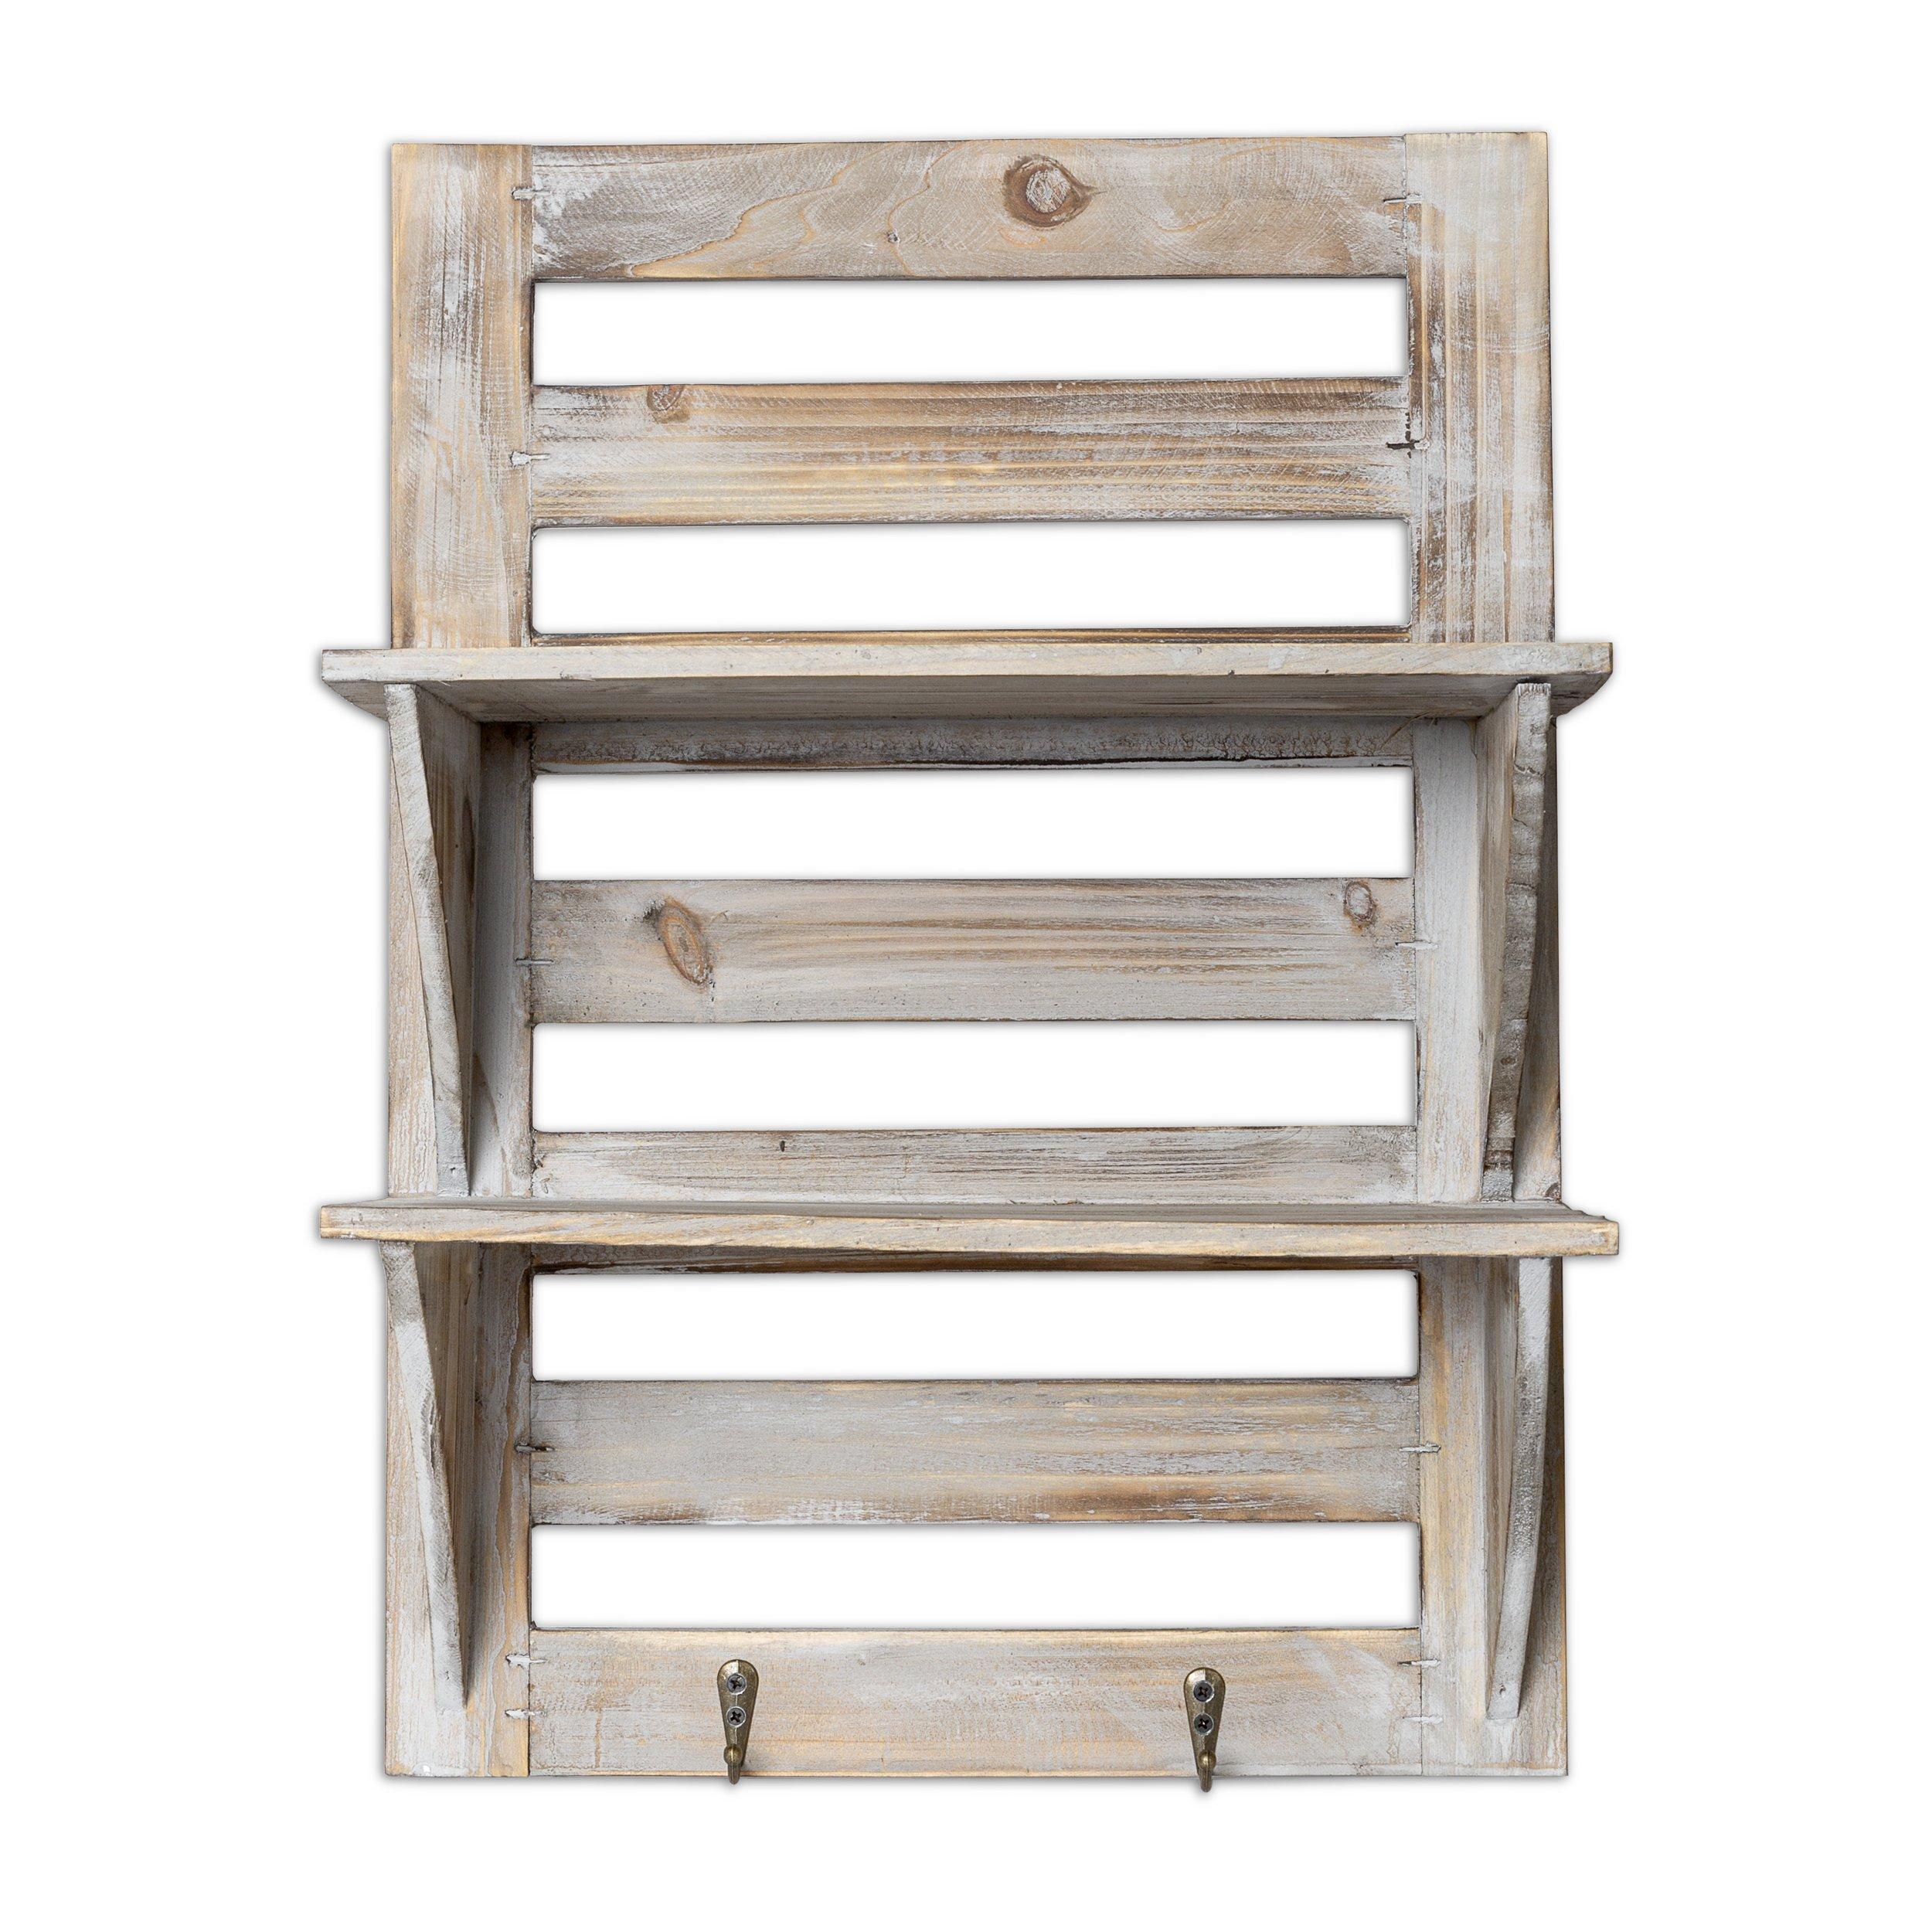 Besti Rustic Wood Wall Shelves With Hanging Hooks Eye